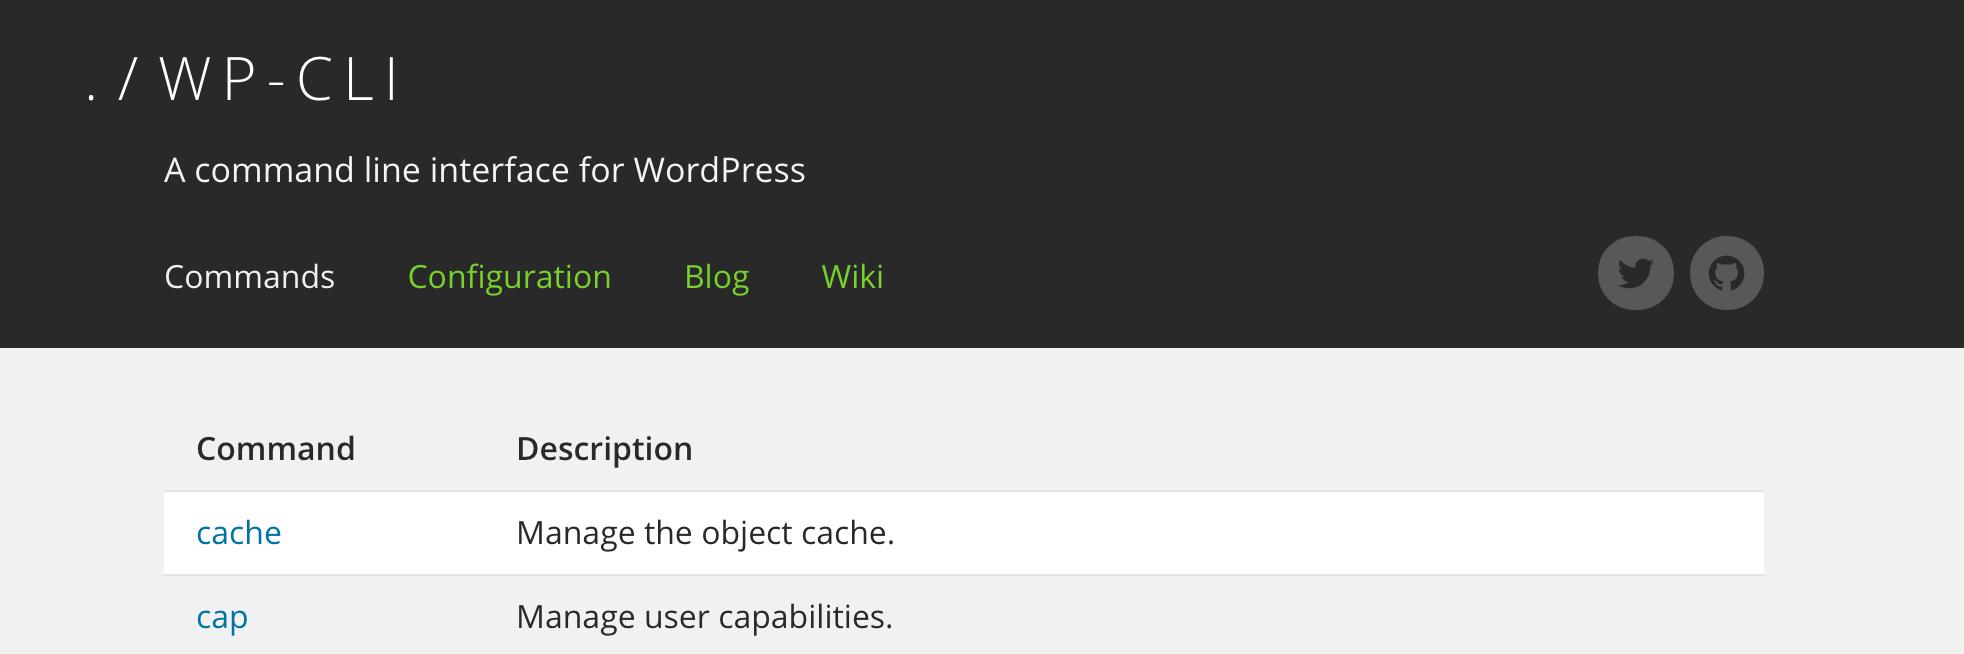 Сайт проекта WP-CLI